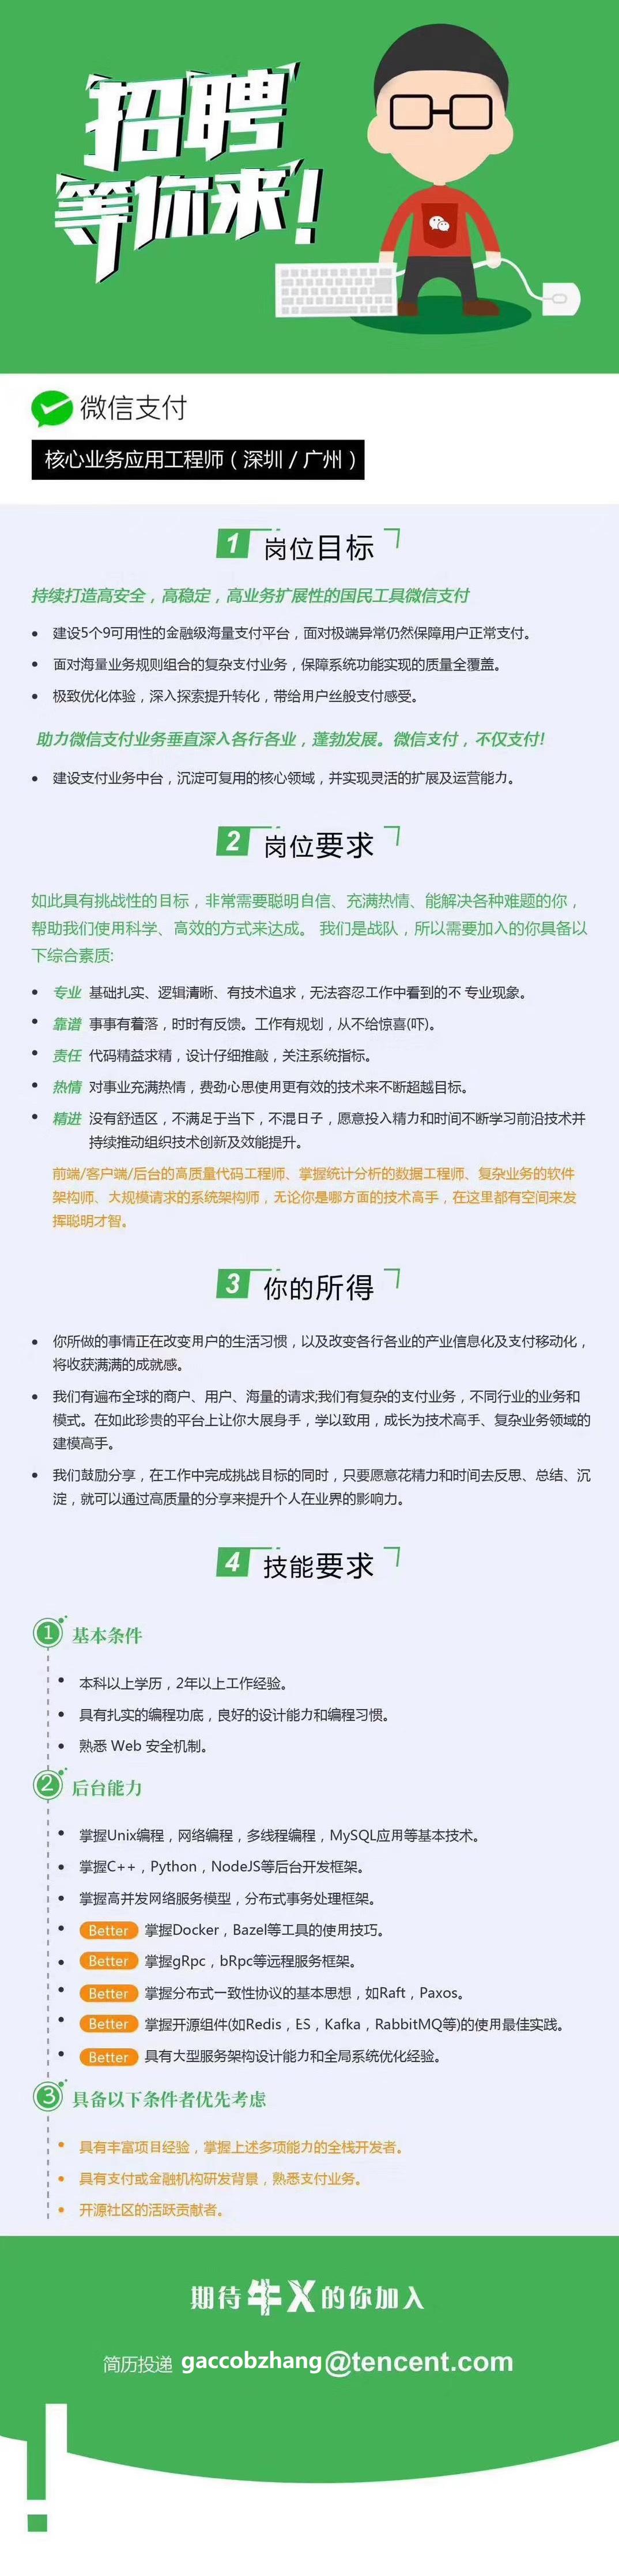 https://asset.droidyue.com/image/2020_03/wechat_payment_jobs.png